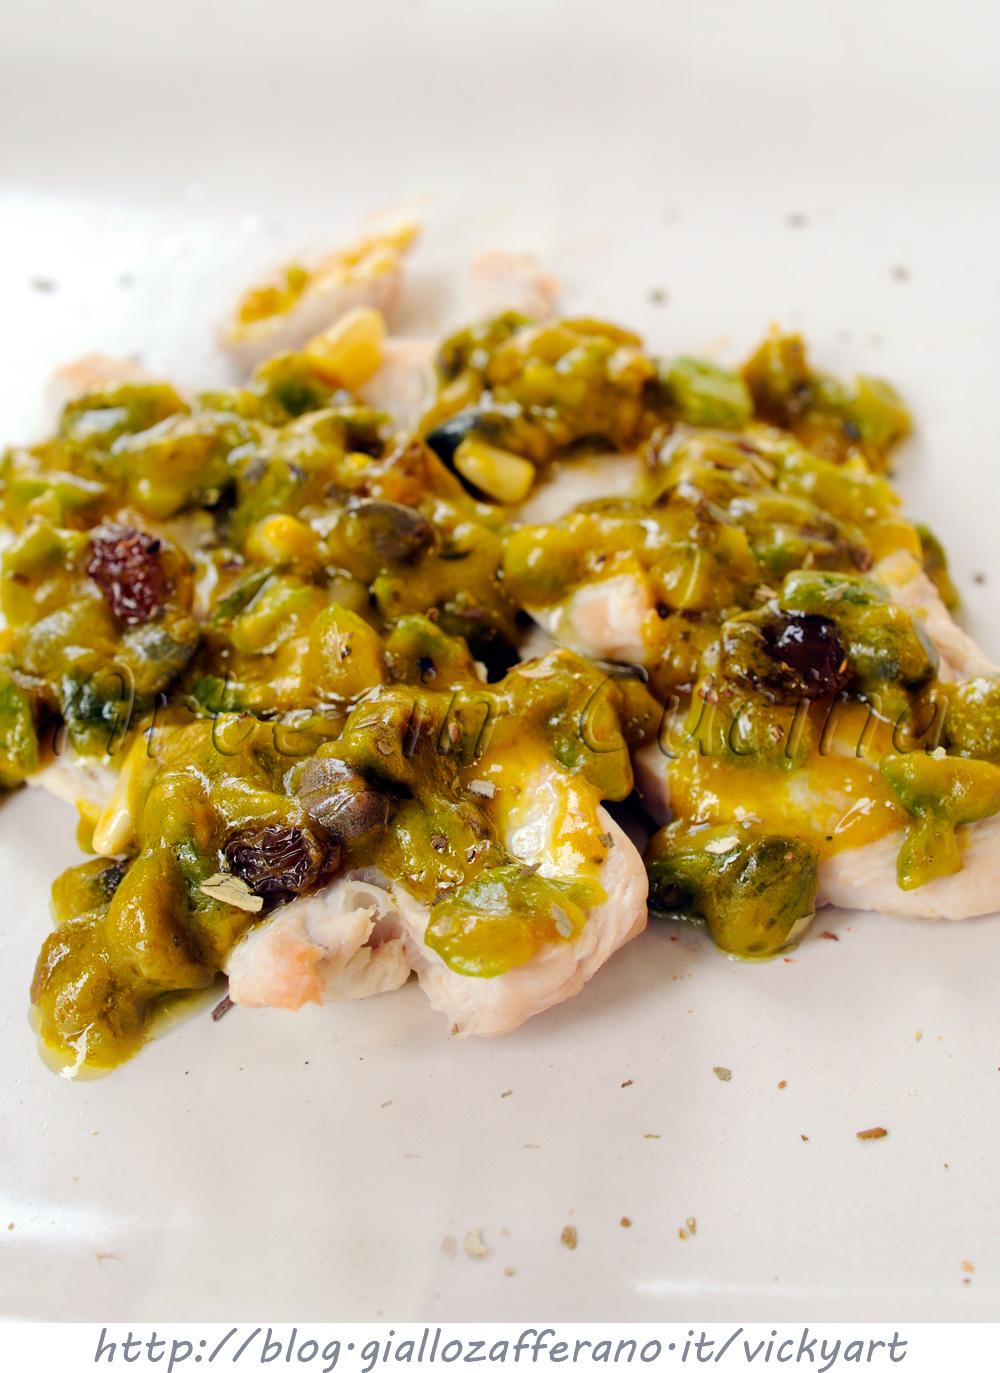 Pollo in salsa saracena ricetta siciliana veloce vickyart arte in cucina